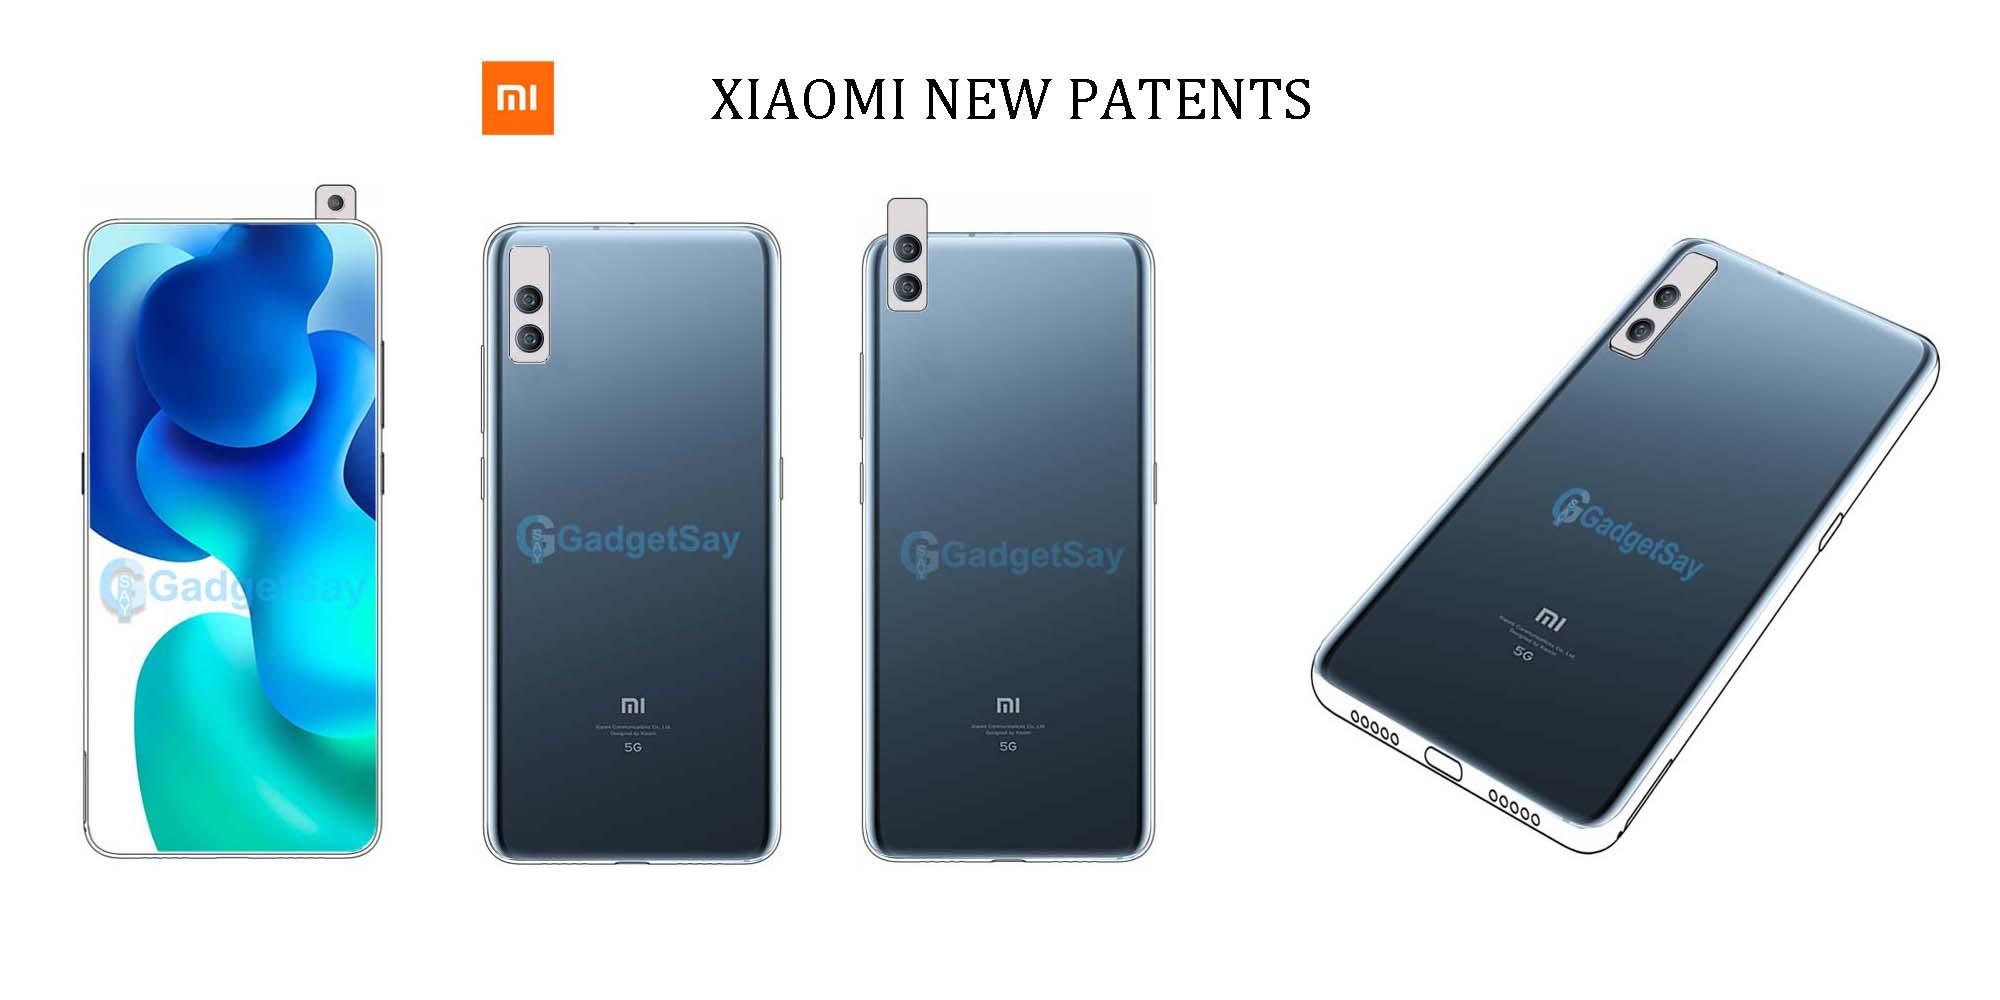 Xiaomi new design patent with sliding camera